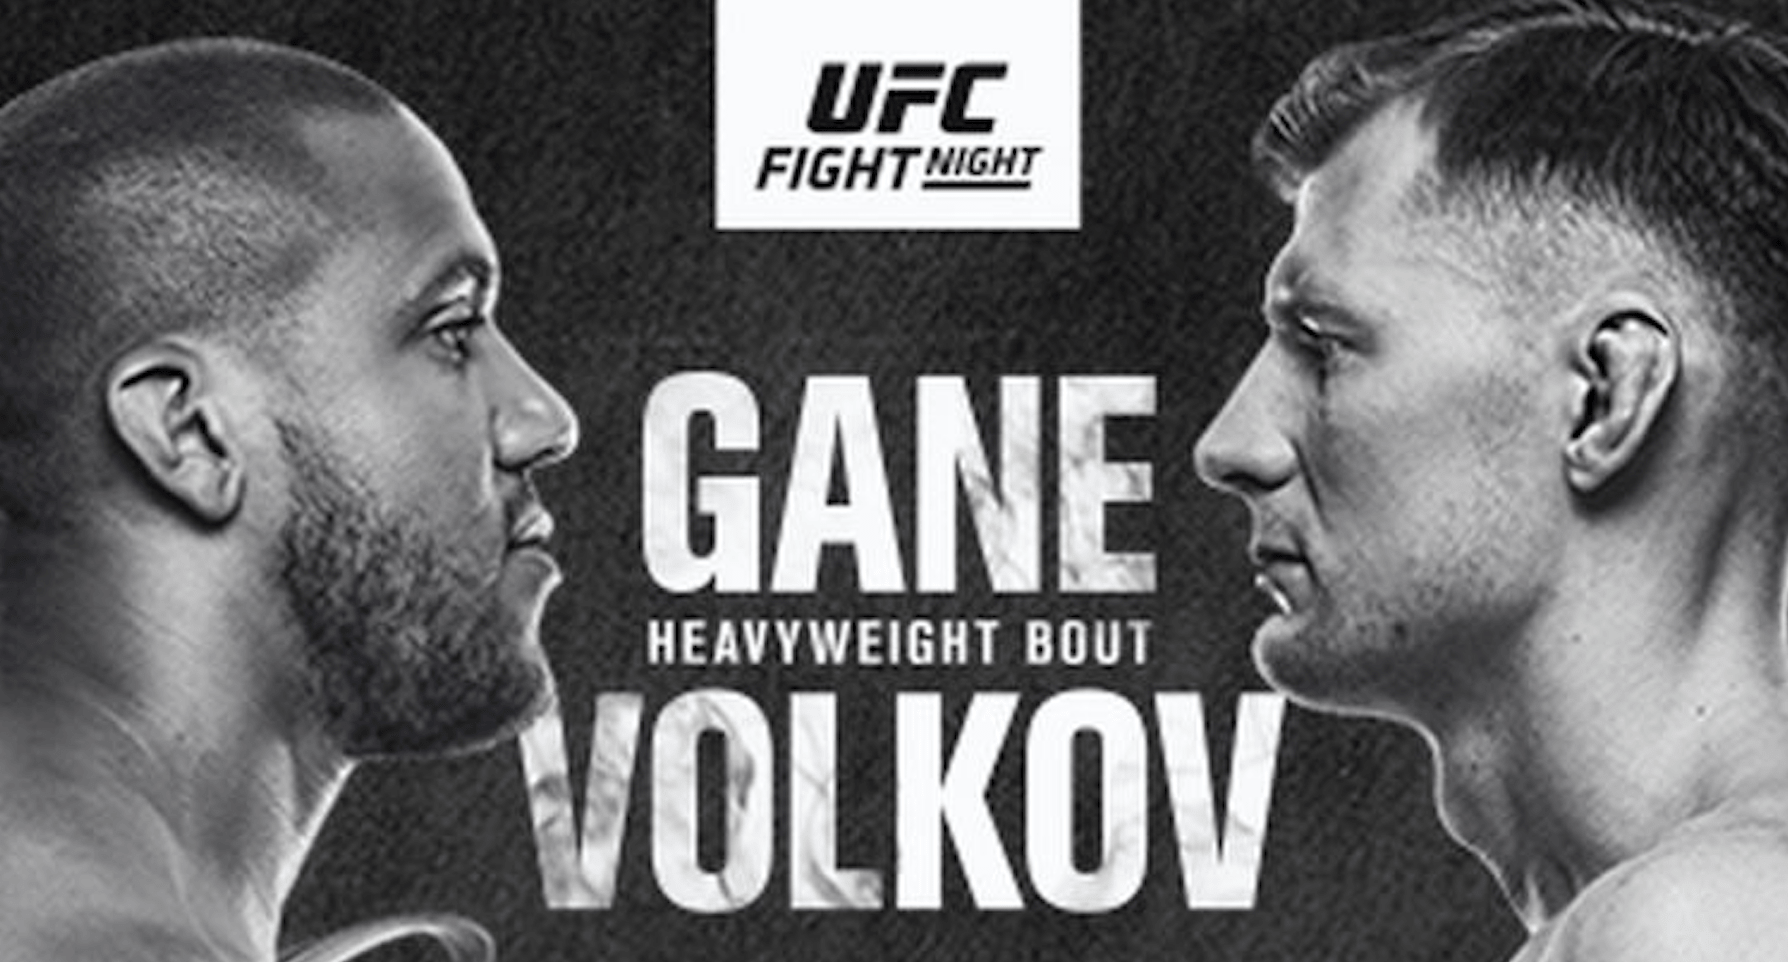 UFC Vegas 30: Gane vs Volkov Results And Post Fight Videos